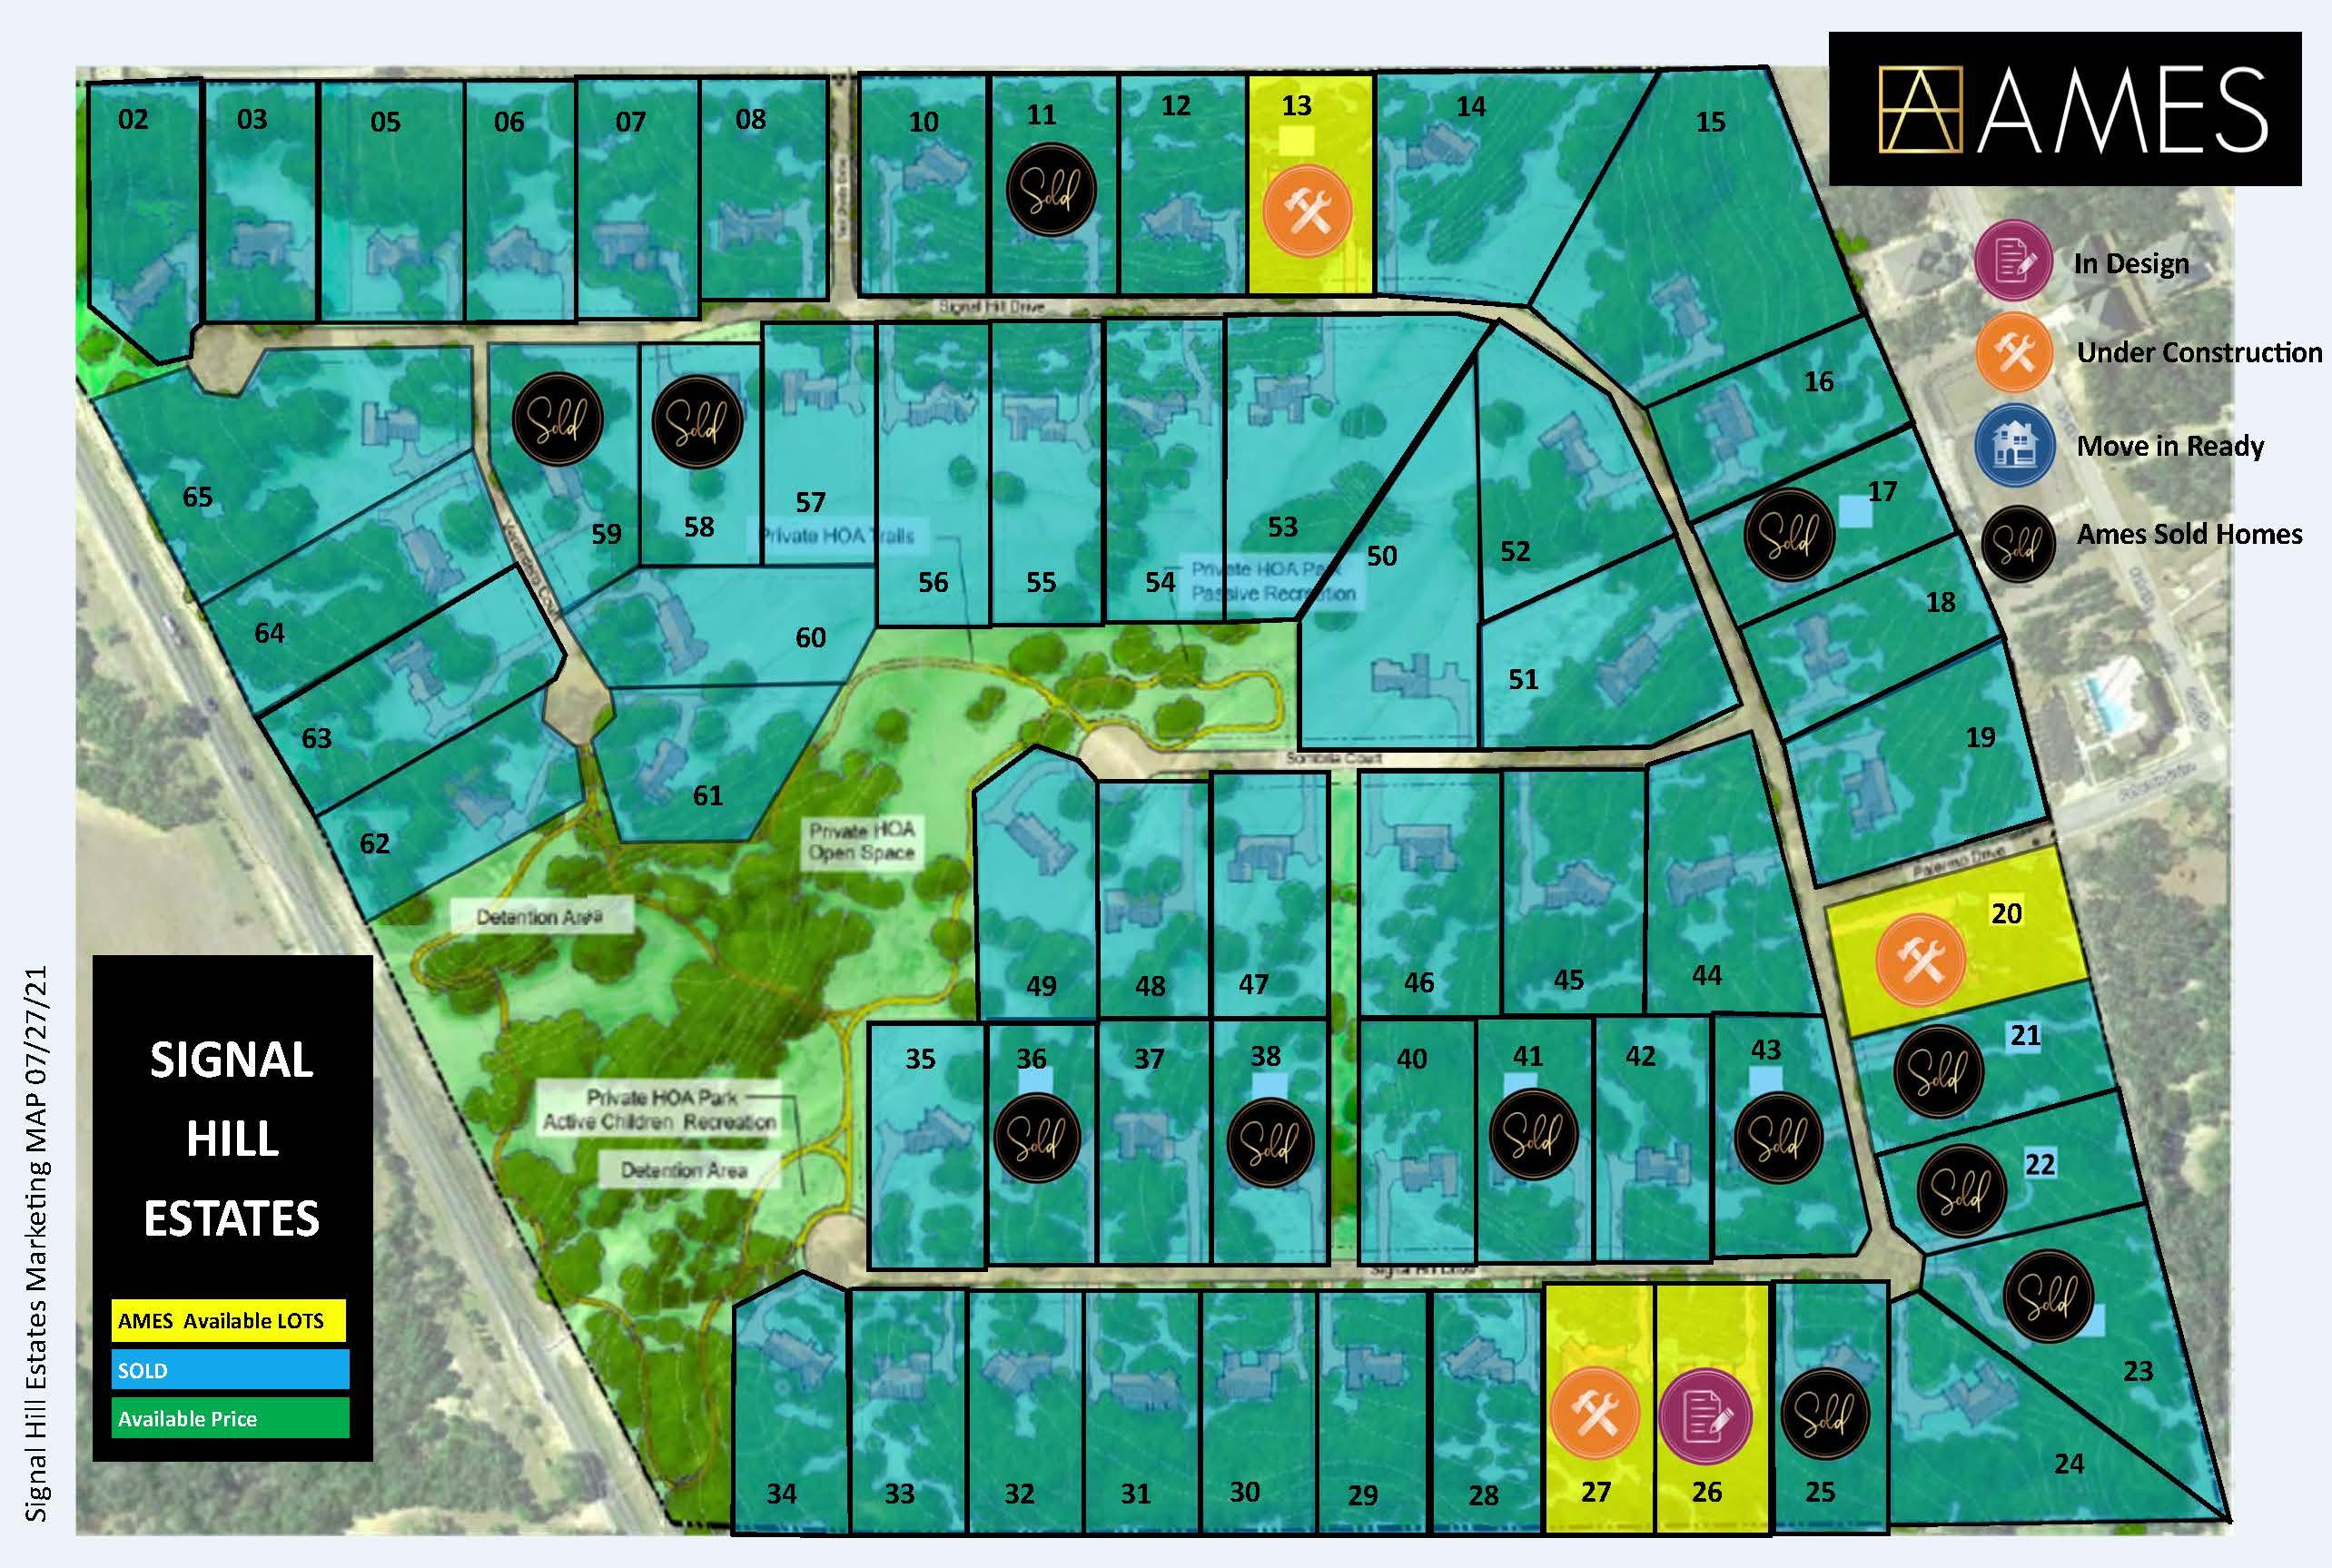 Signal Hill Estates Map